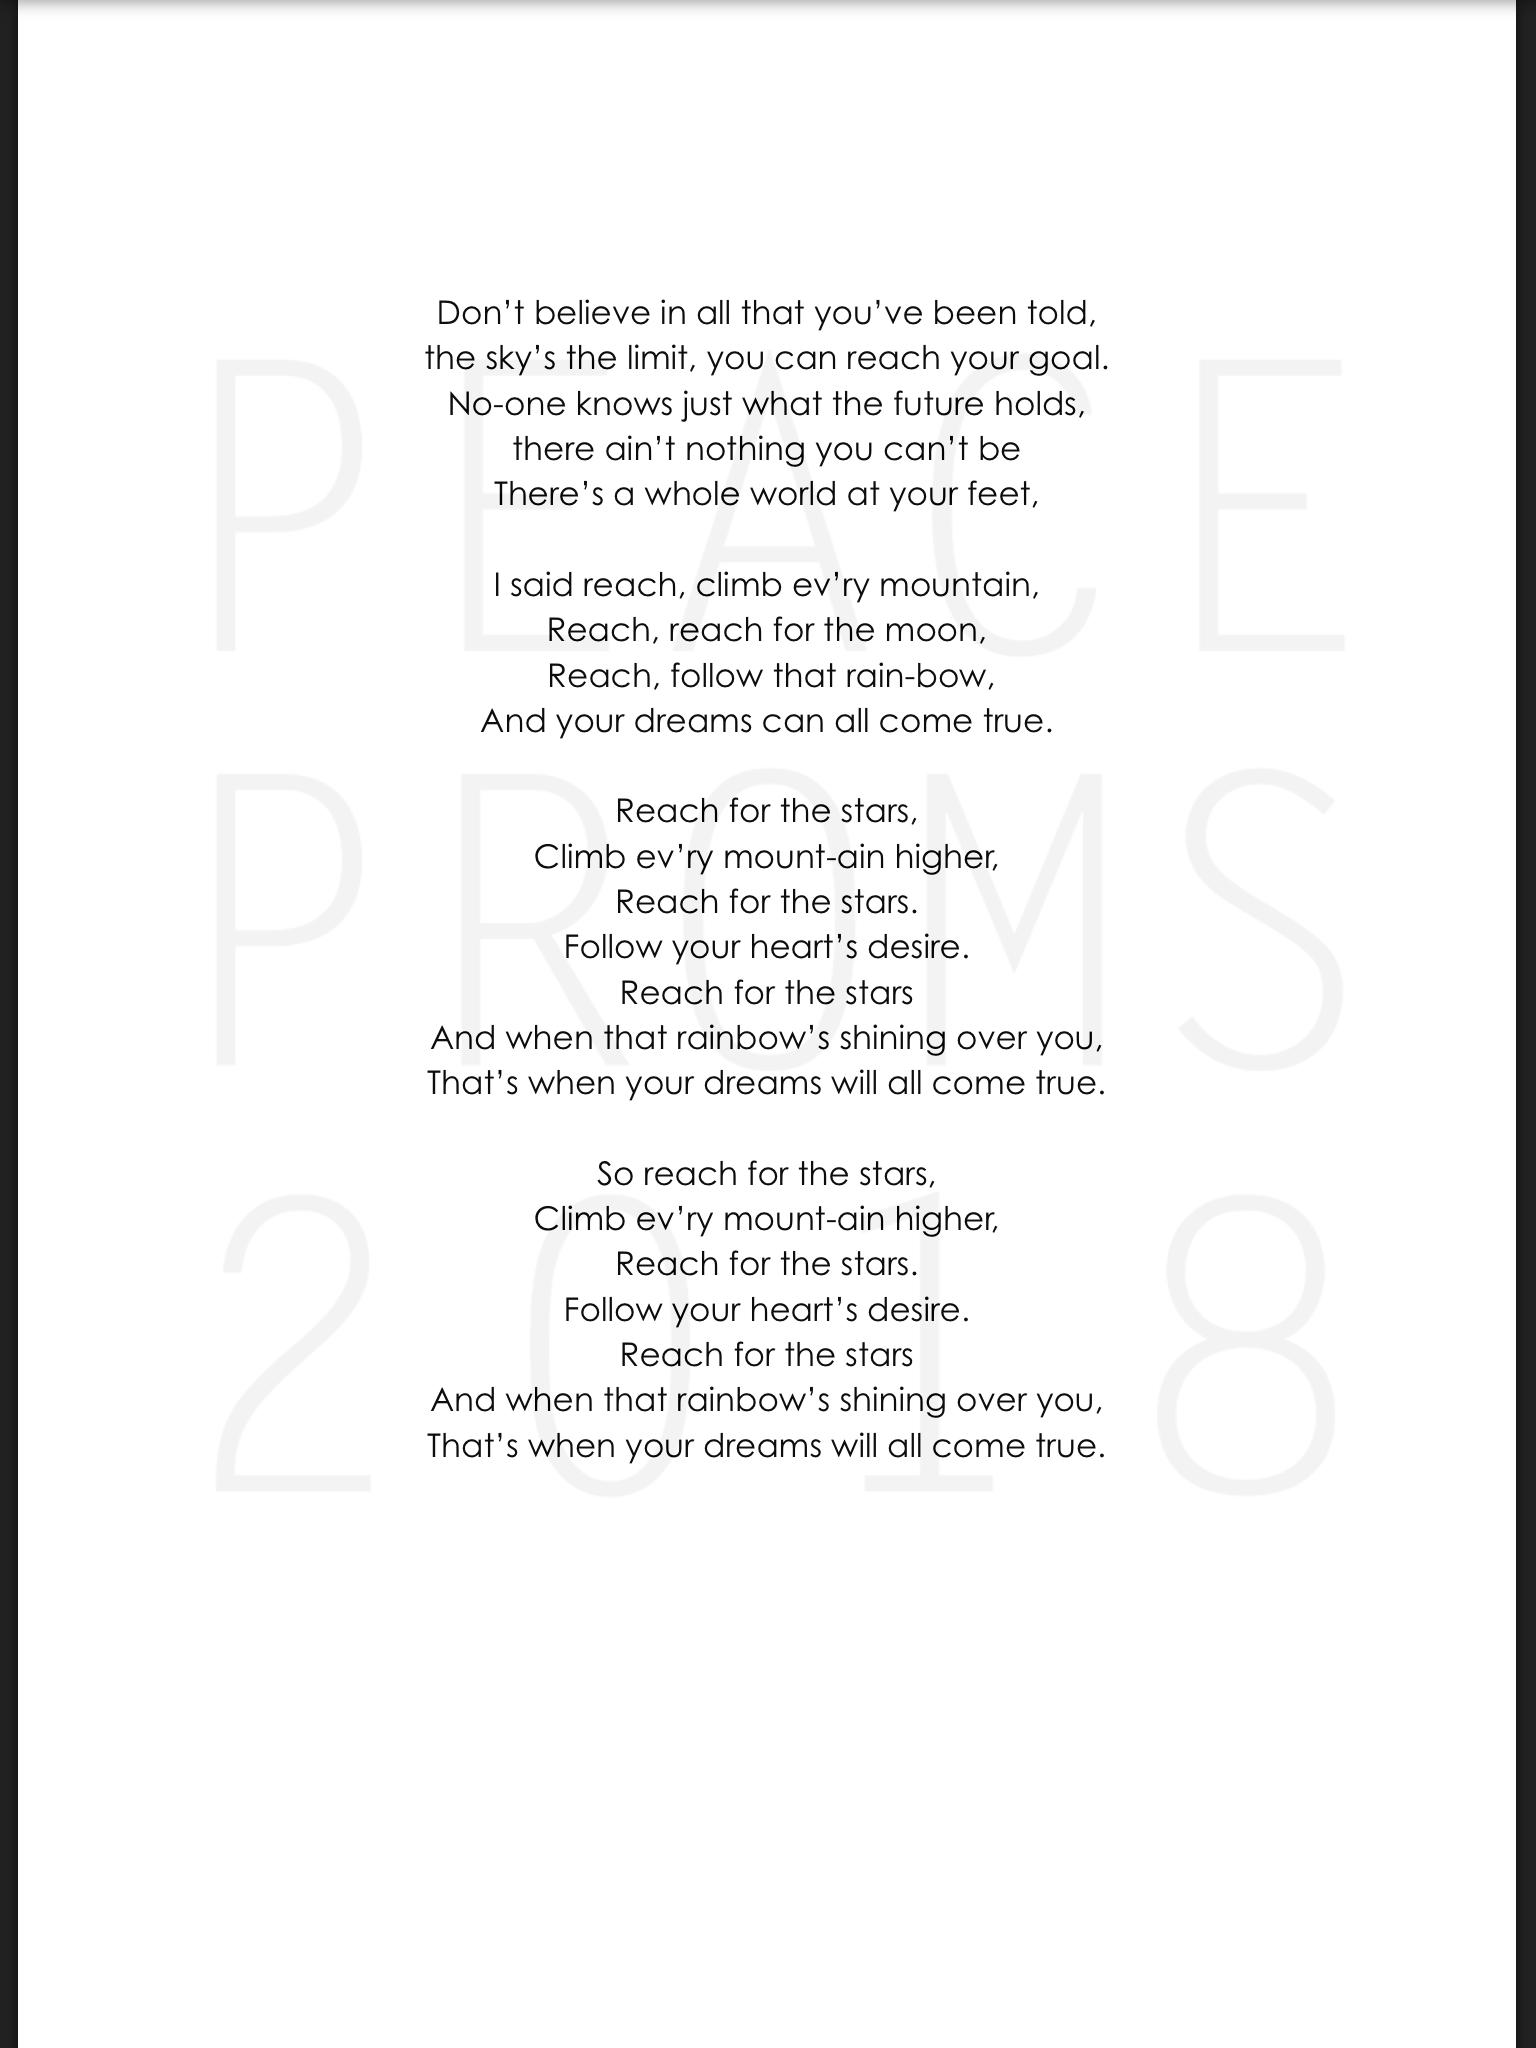 Peace proms cetns reach lyrics part 2 stopboris Gallery